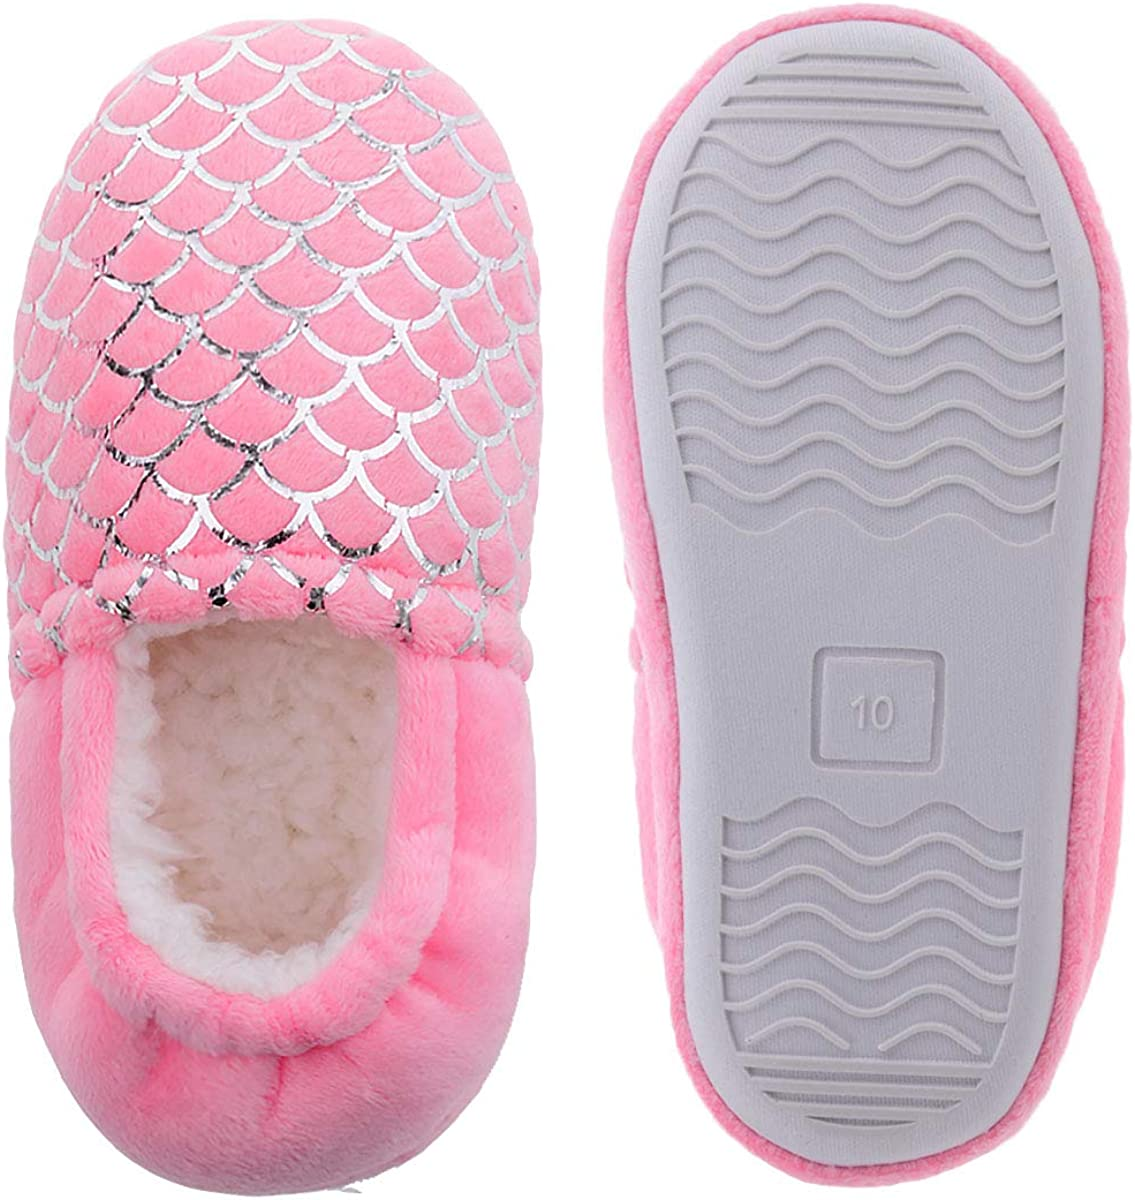 MIXIN Little Kids Girls Plush Warm House Slippers